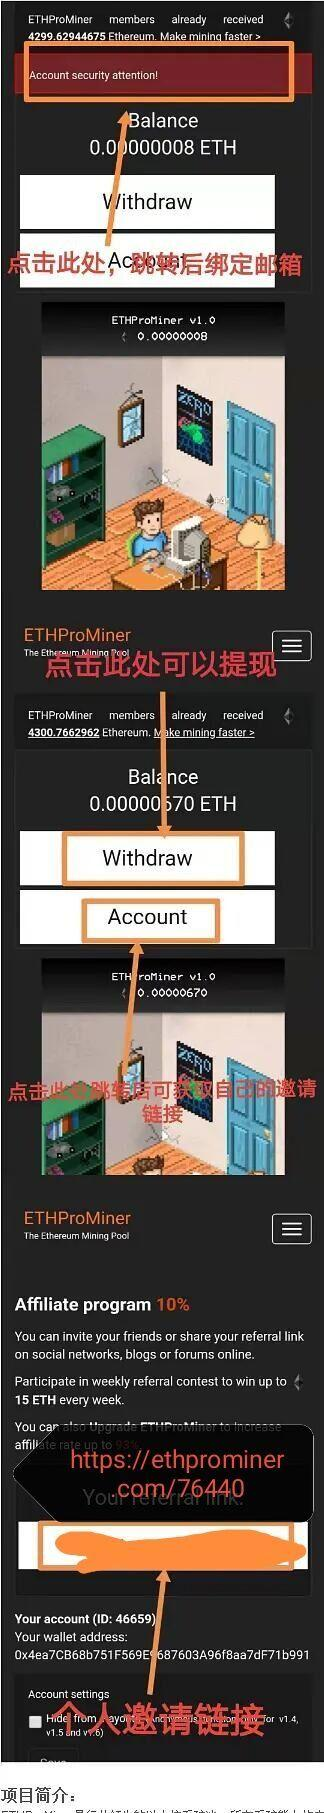 ETHProMiner:免费每日0.003ETH,满0.1ETH可提-爱首码网